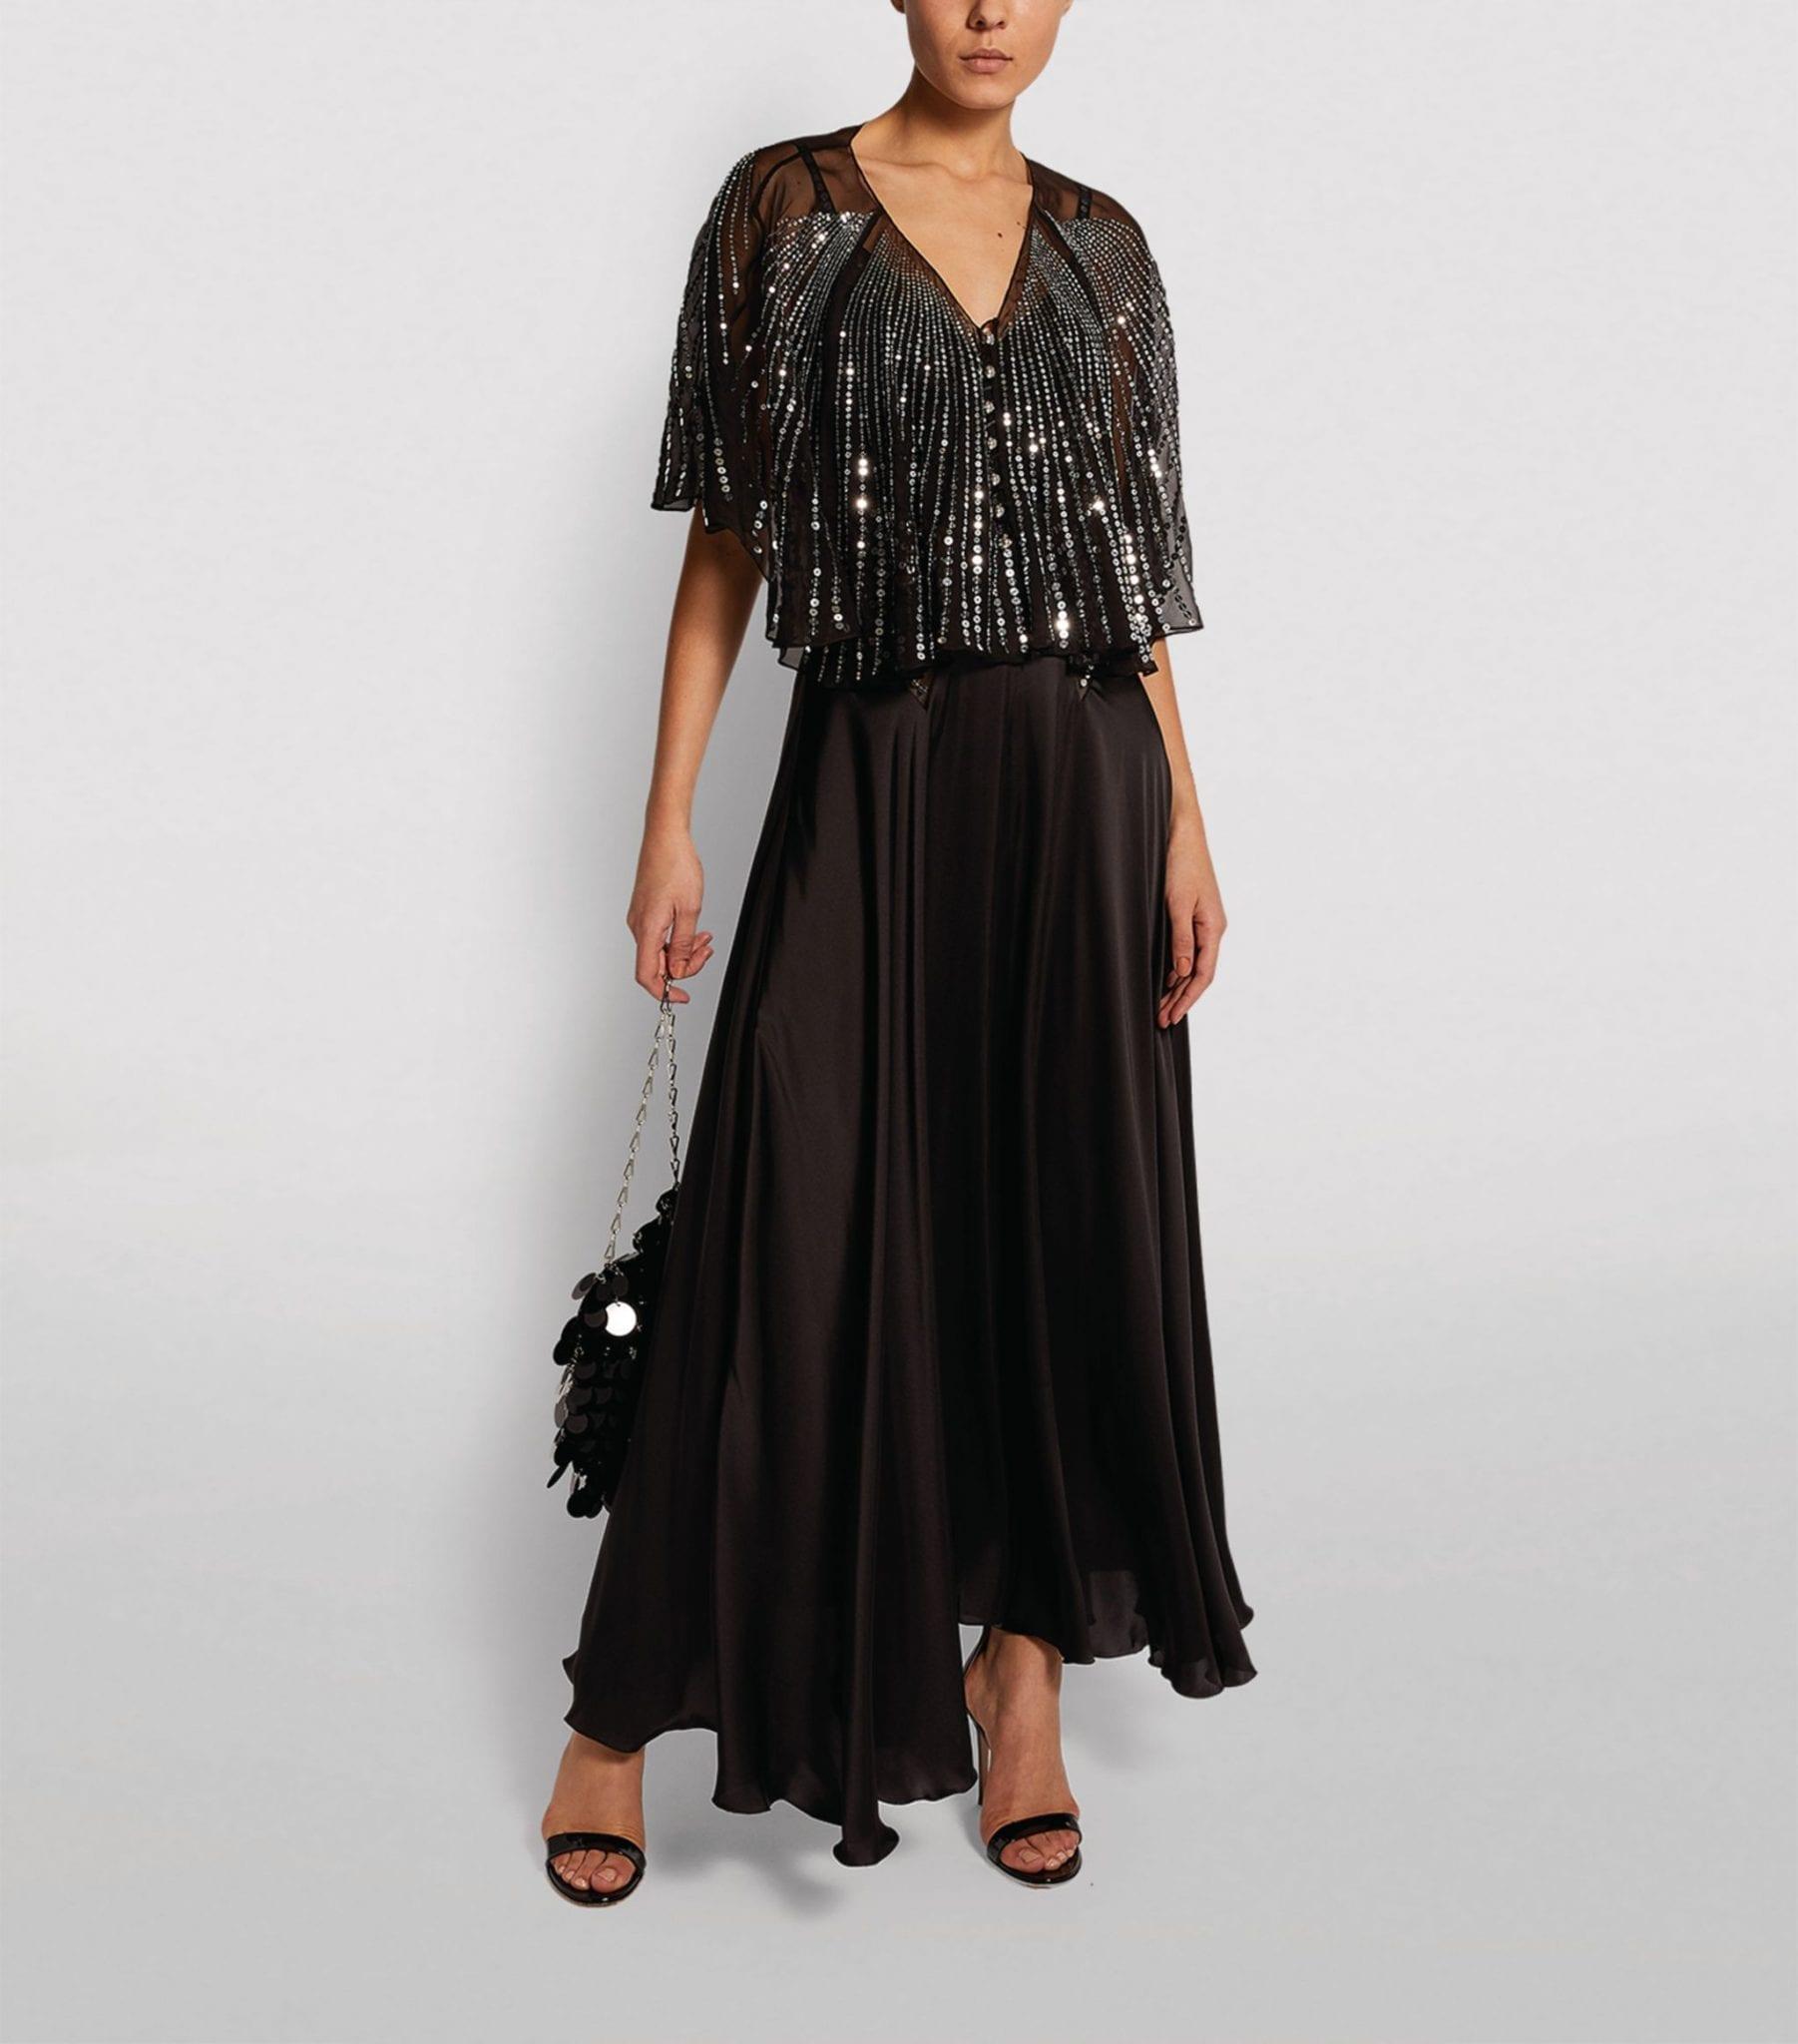 PACO RABANNE Embellished Cape Maxi Dress